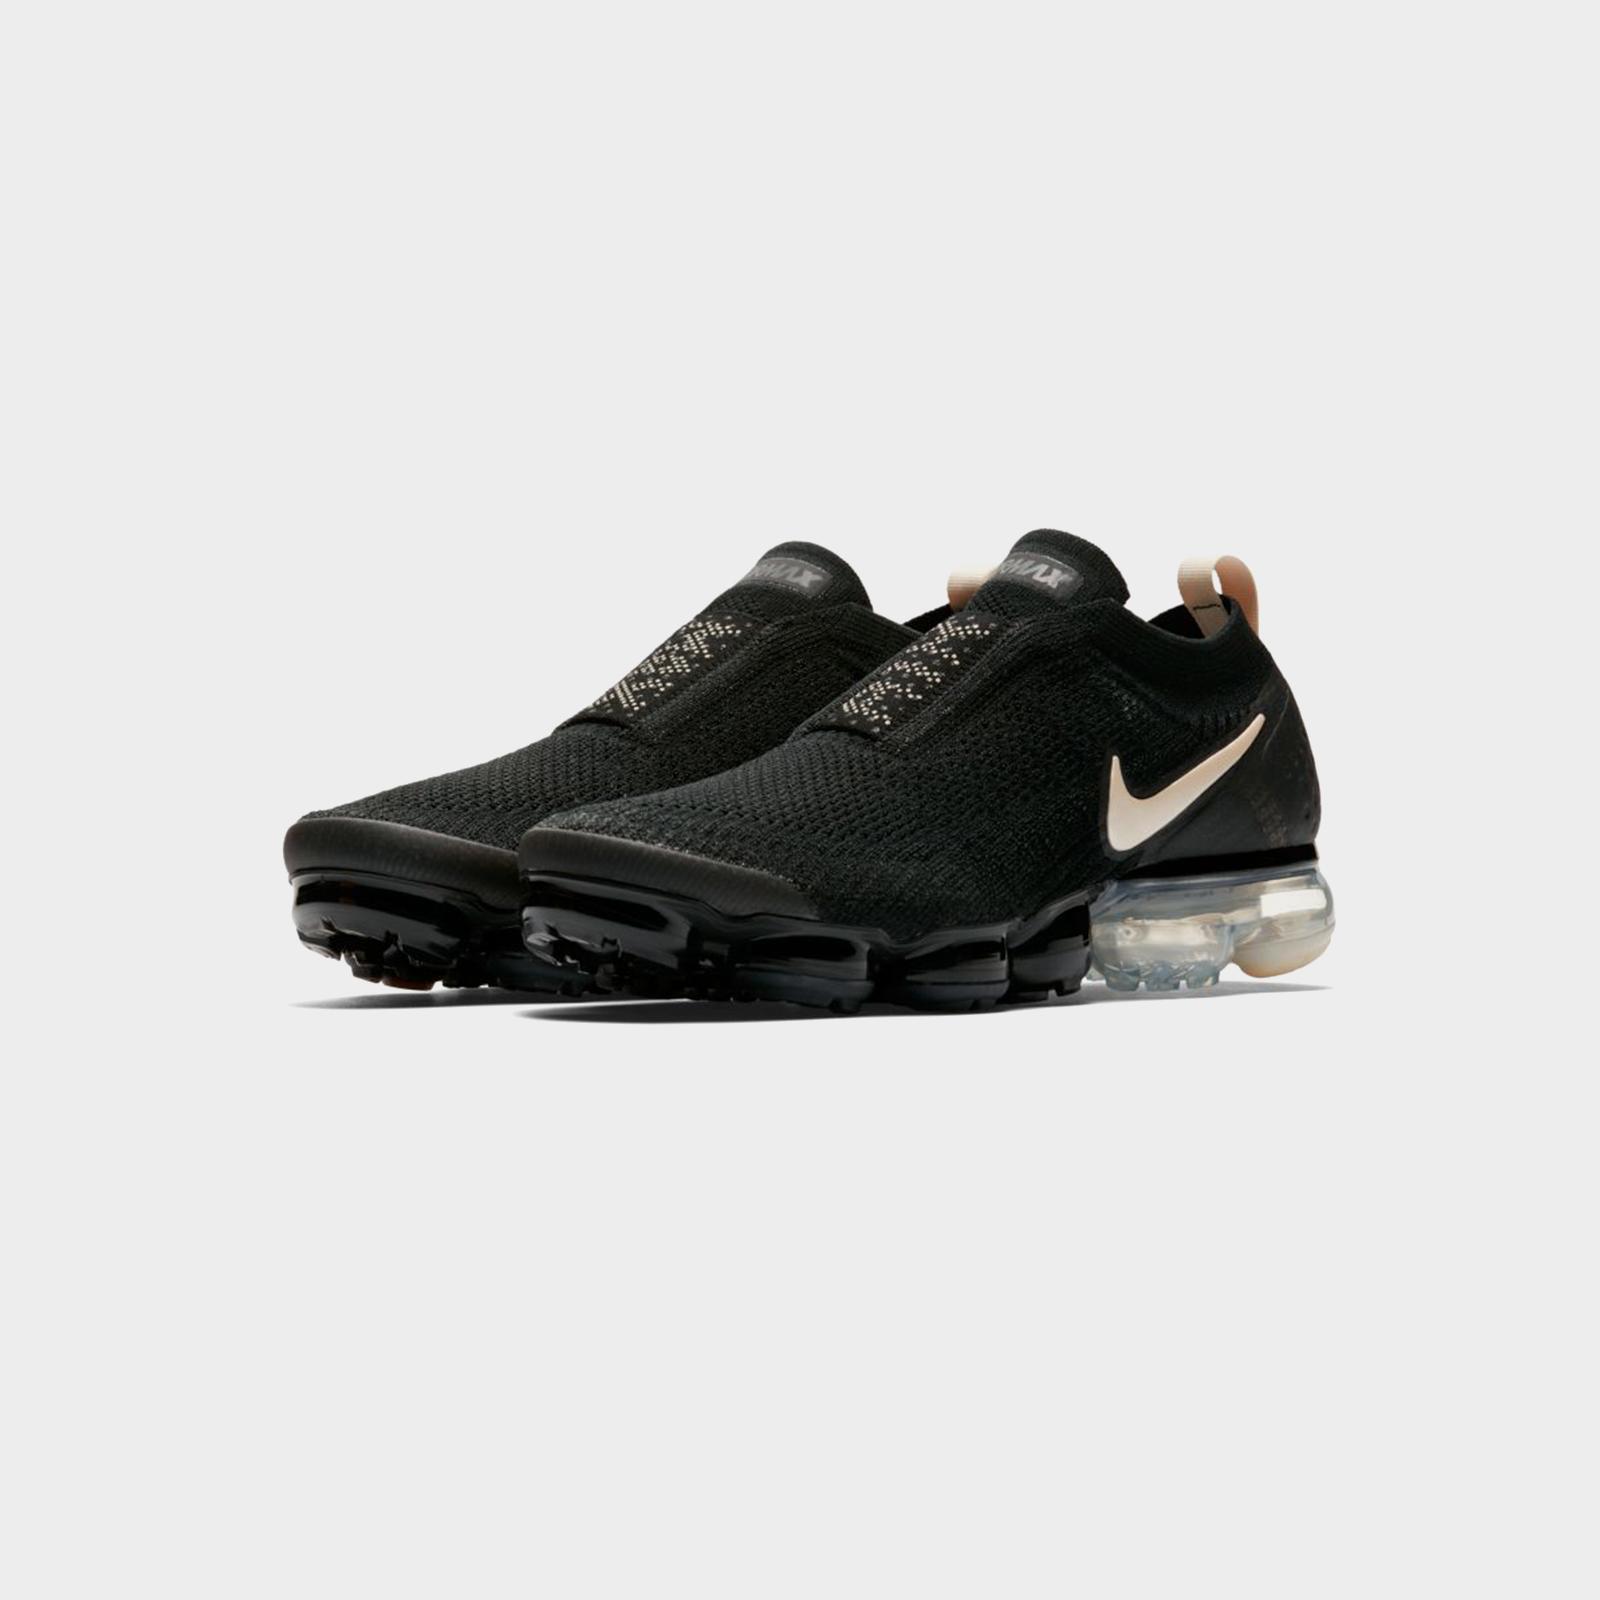 d089bc84fdfc Nike Air Vapormax Fk Moc 2 - Ah7006-002 - Sneakersnstuff